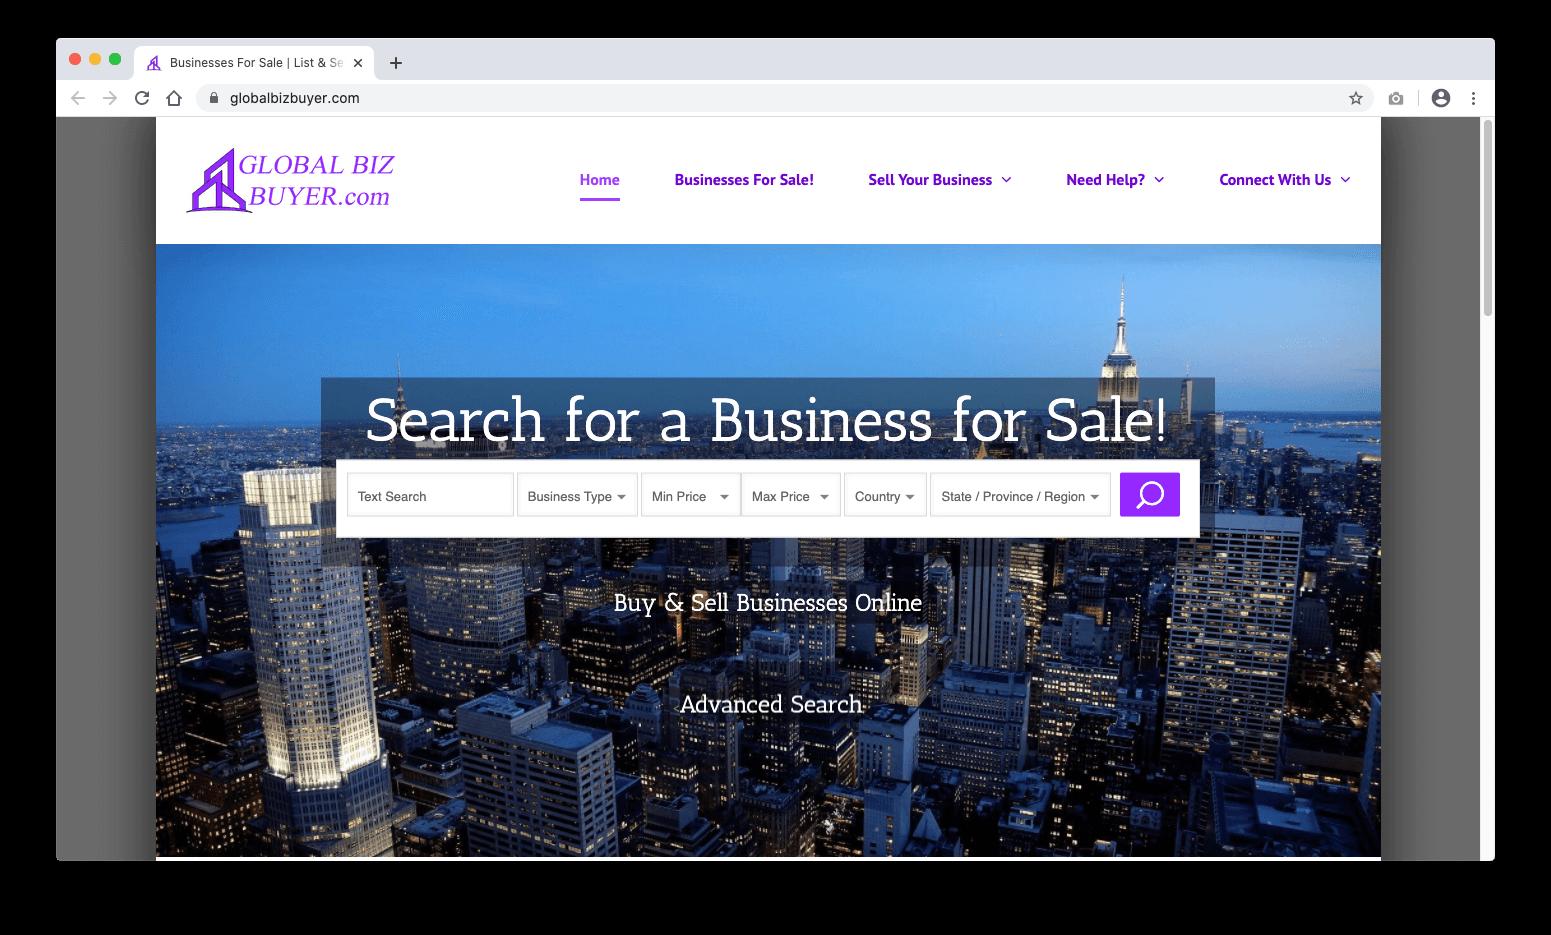 Global Biz Buyer Website | Buy & Sell Bossiness Online